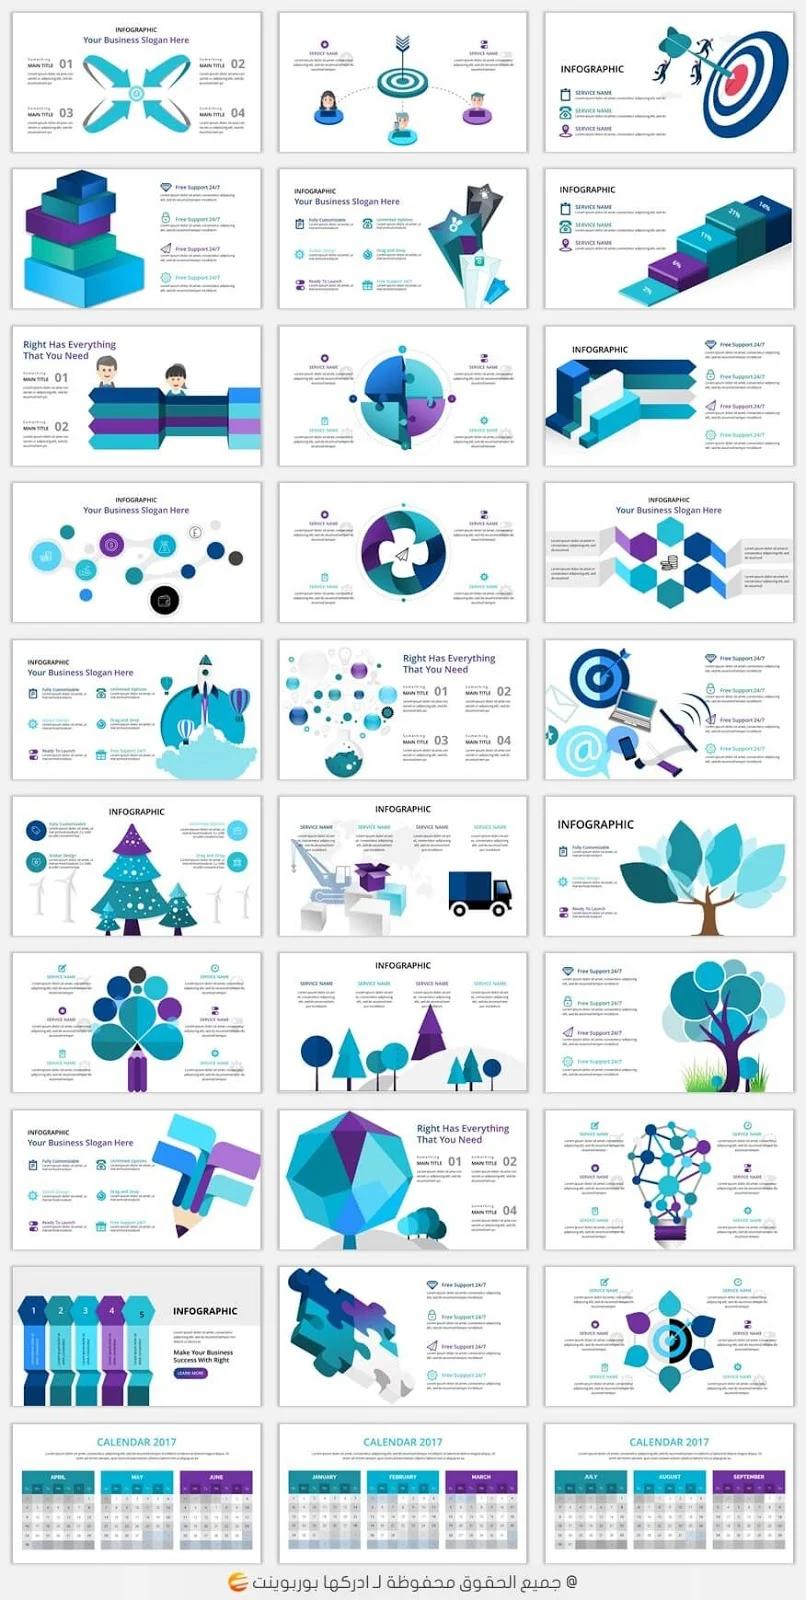 تحميل قالب بوربوينت احترافي جاهز للتعديل Ppt ادركها بوربوينت Infographic Design Template Infographic Templates Graphic Design Background Templates